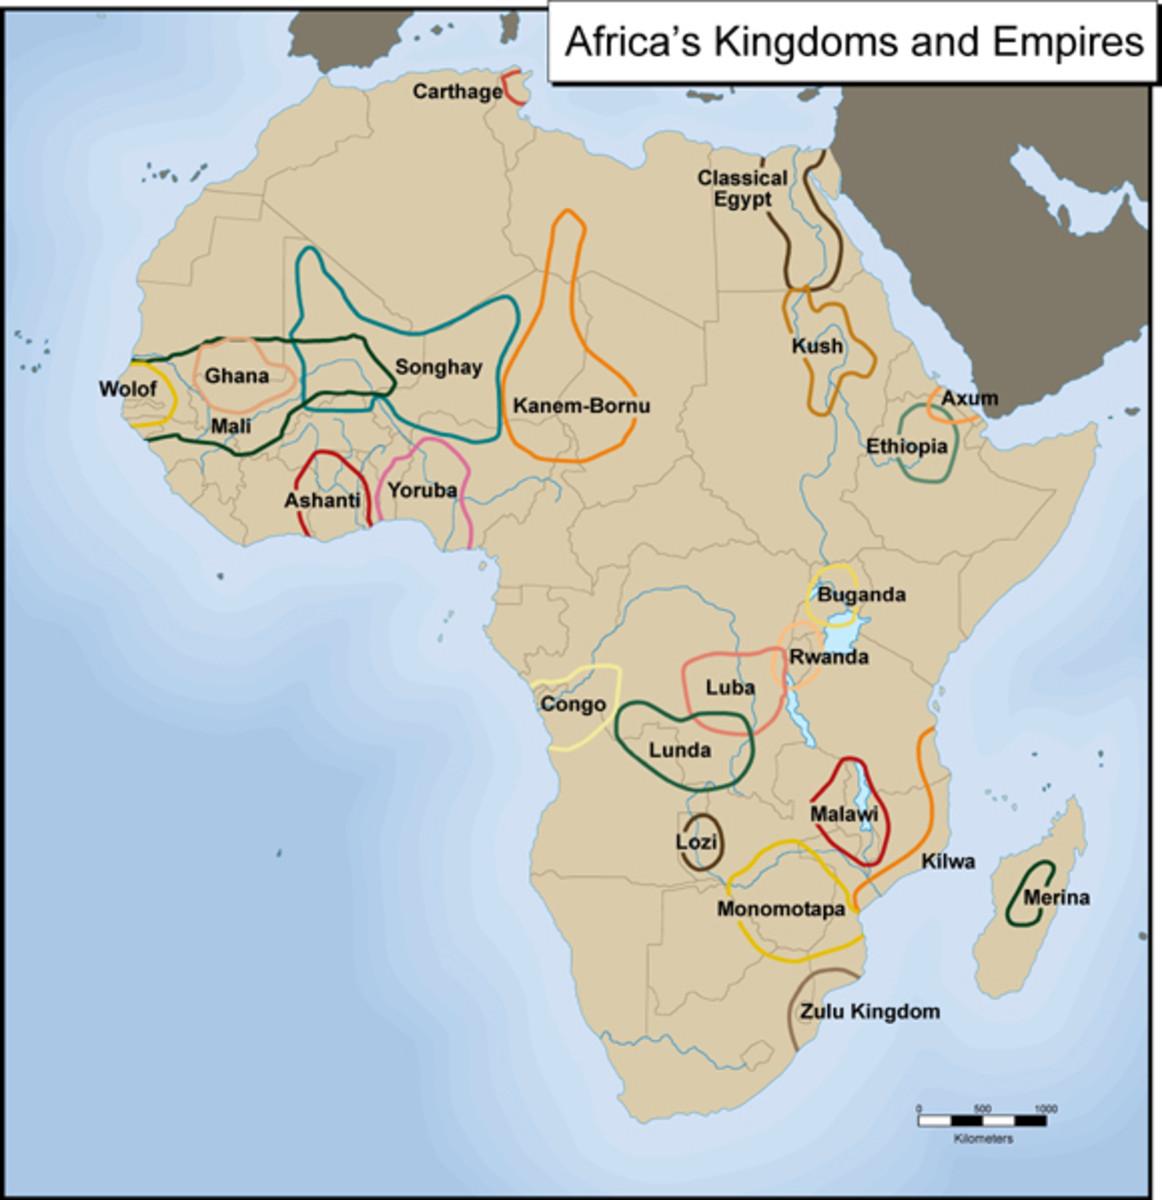 Monomotapa and other African Kingdms